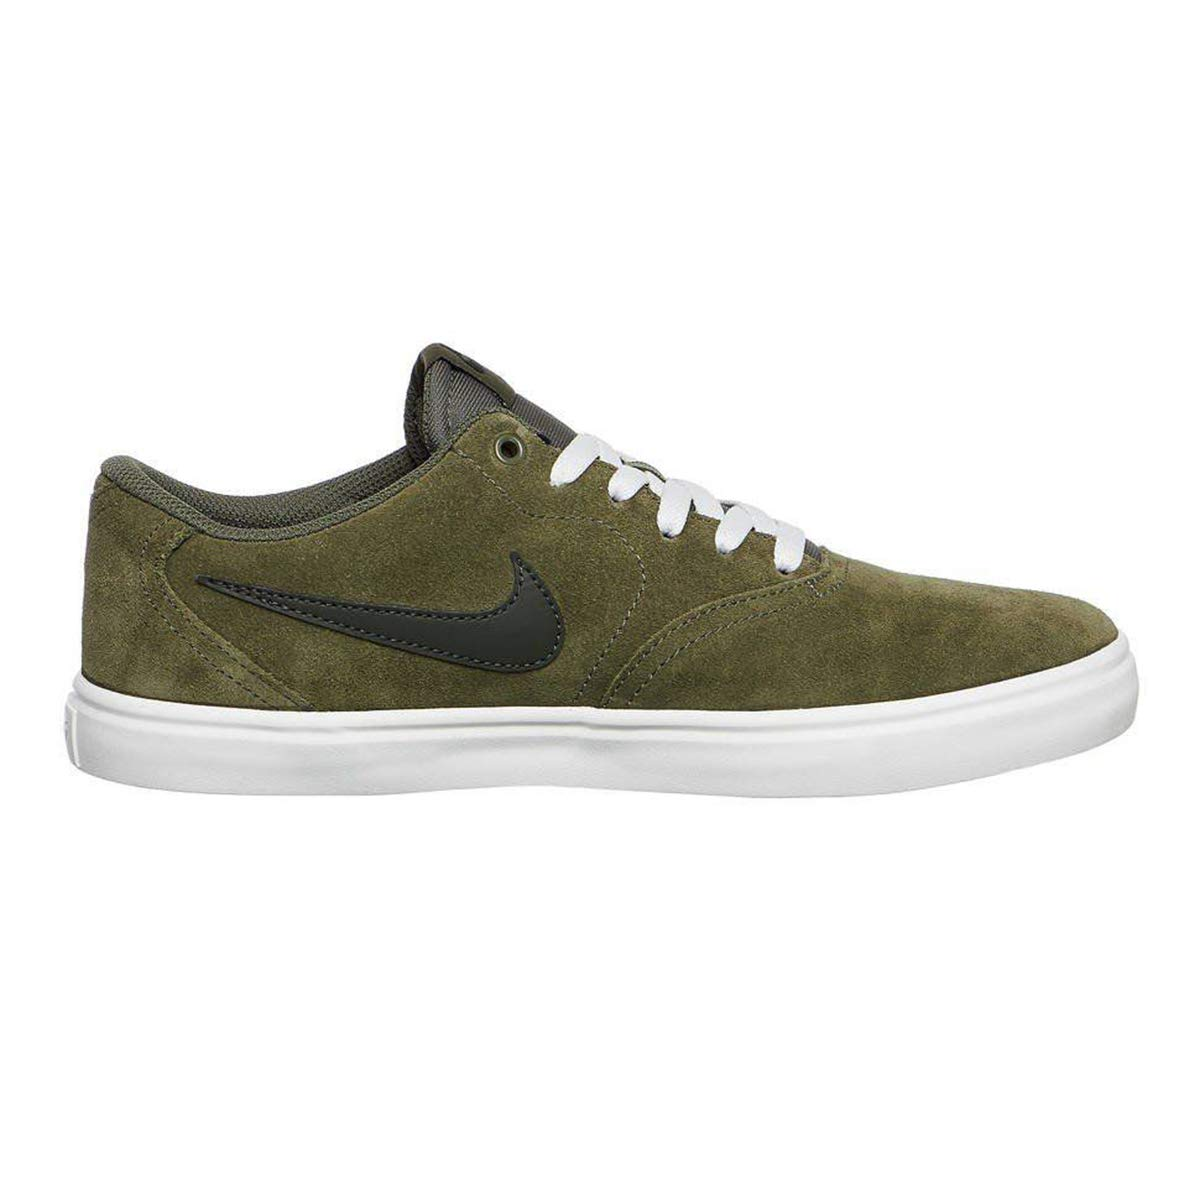 3b90d1b67362f Galleon - NIKE Men's SB Check Solar Shoes Olive/Sequoia/Summit White 7.5